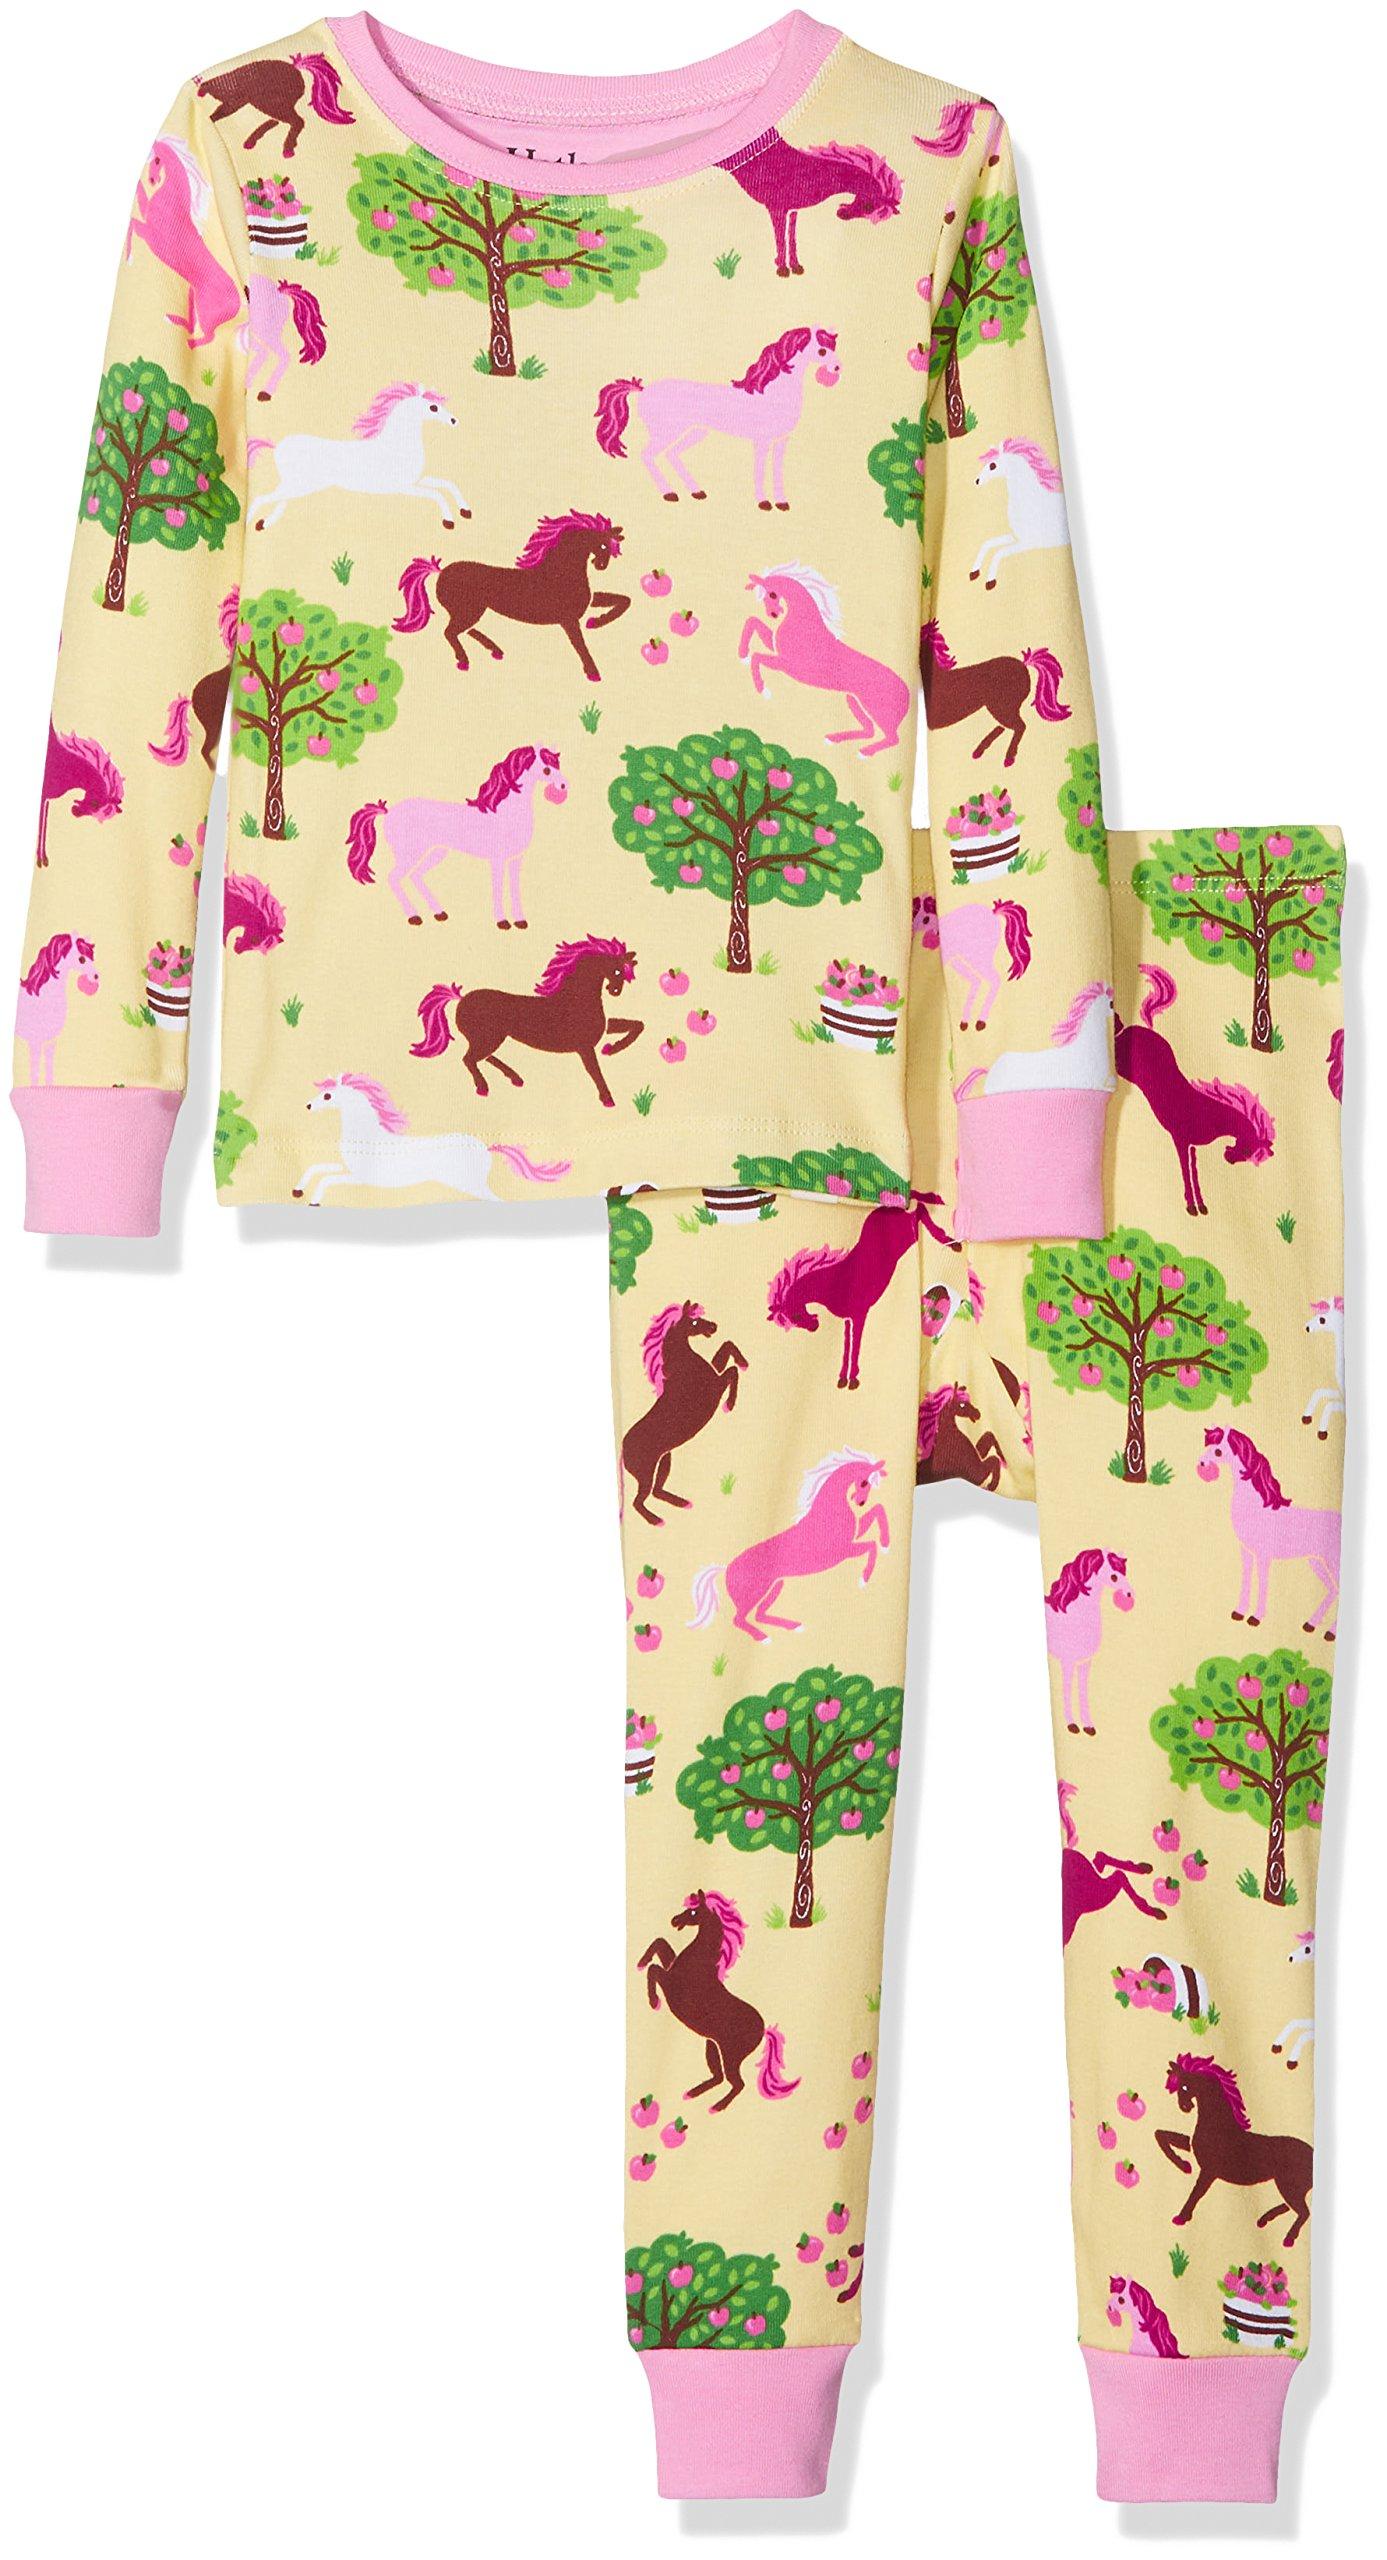 Hatley Pyjama Set - Pony Orchard - 3 Years - 97 cms